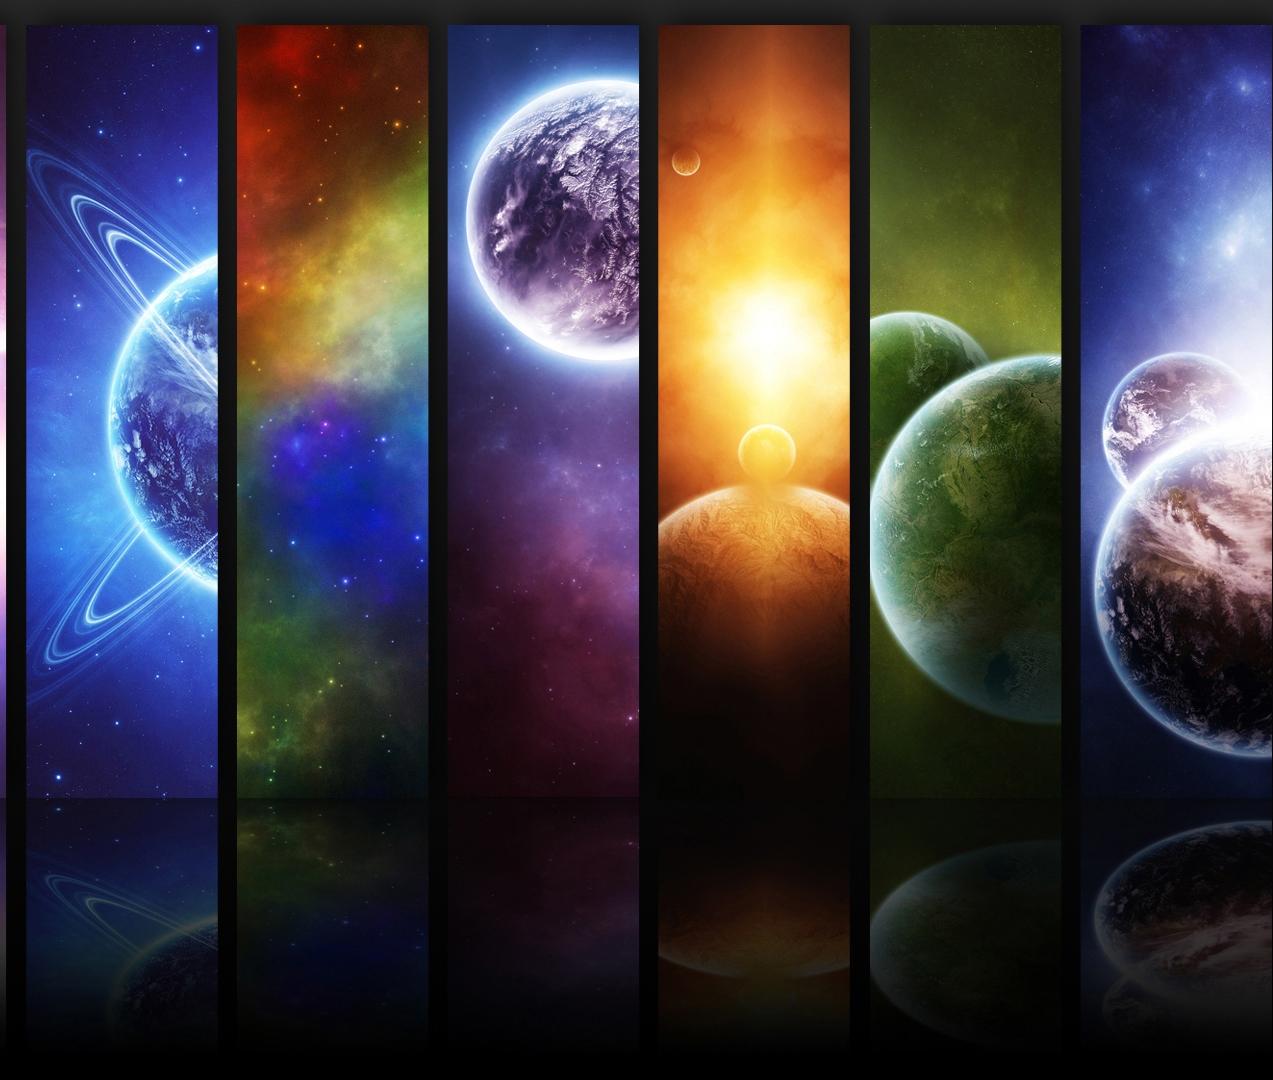 Inmensitat I Bellesa: Astronimia I Qualitat Humana Profunda